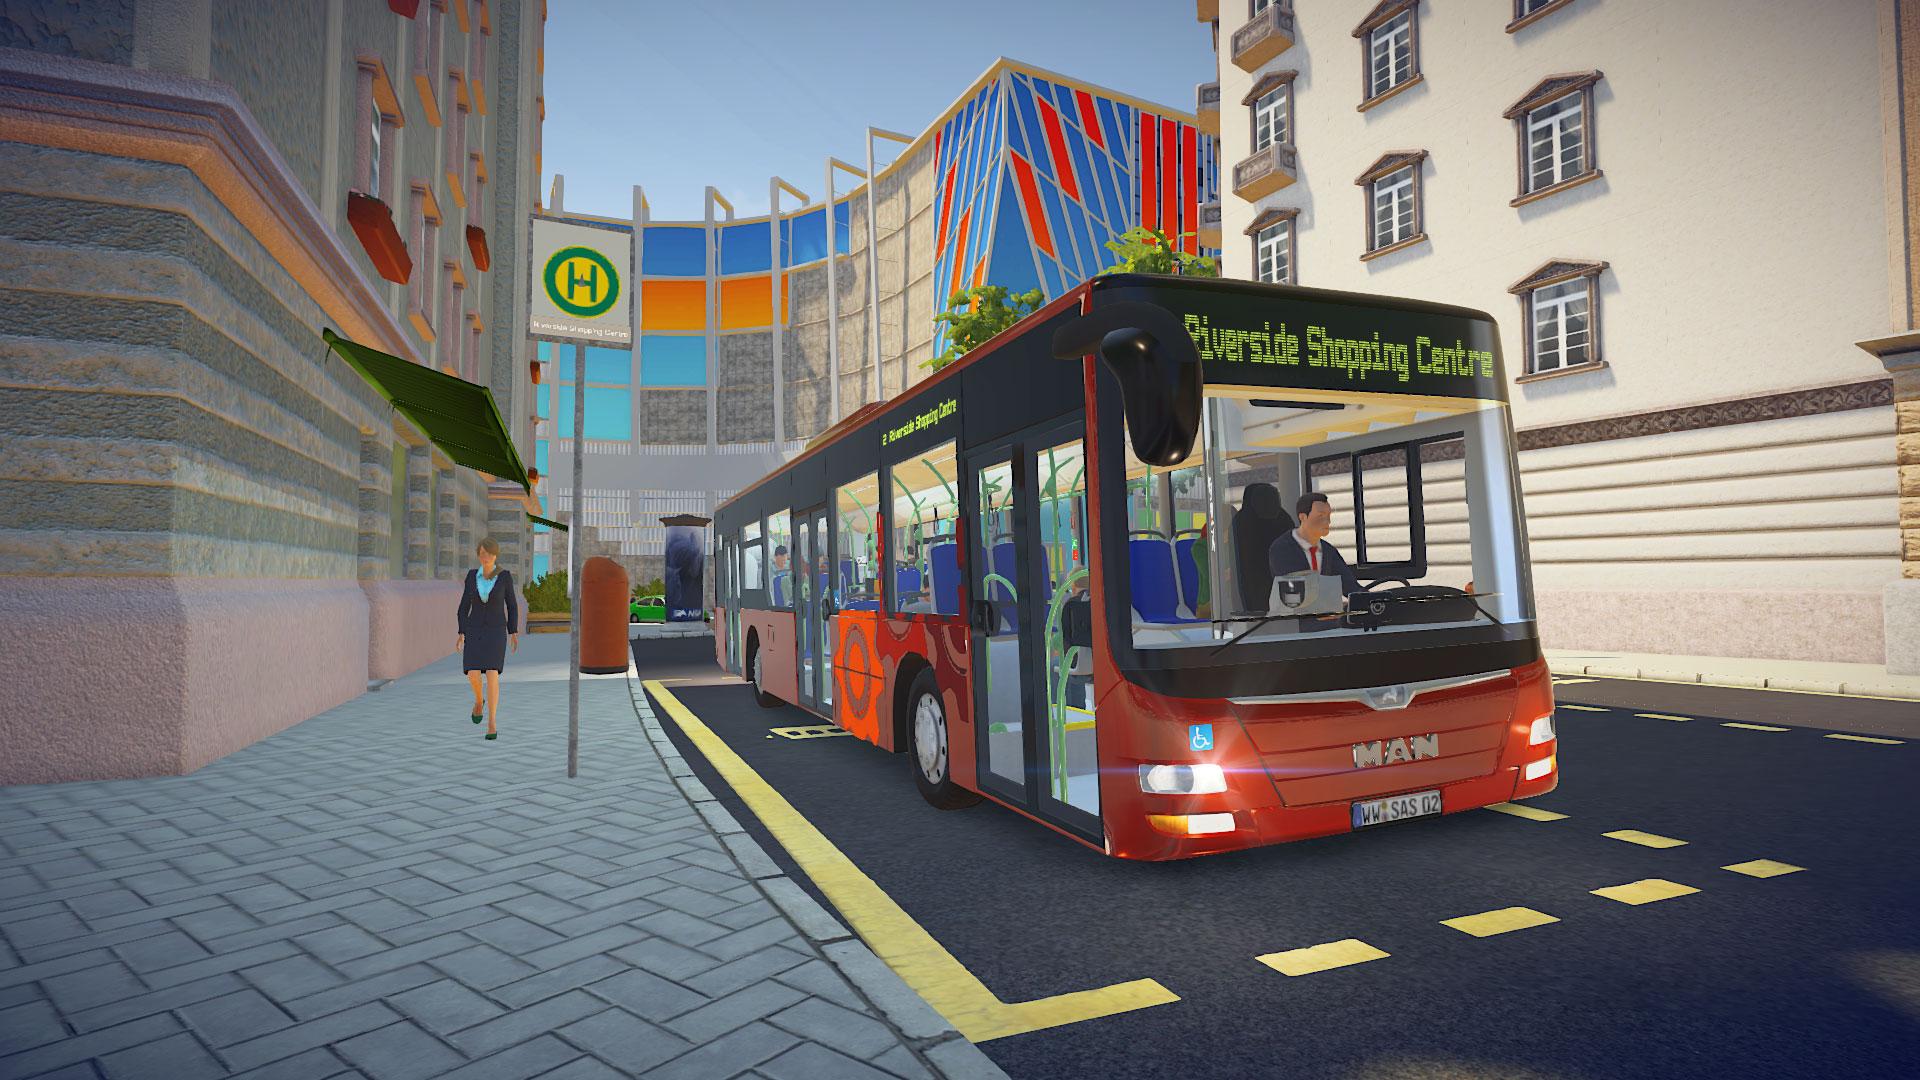 fernbus simulator download 32 bit